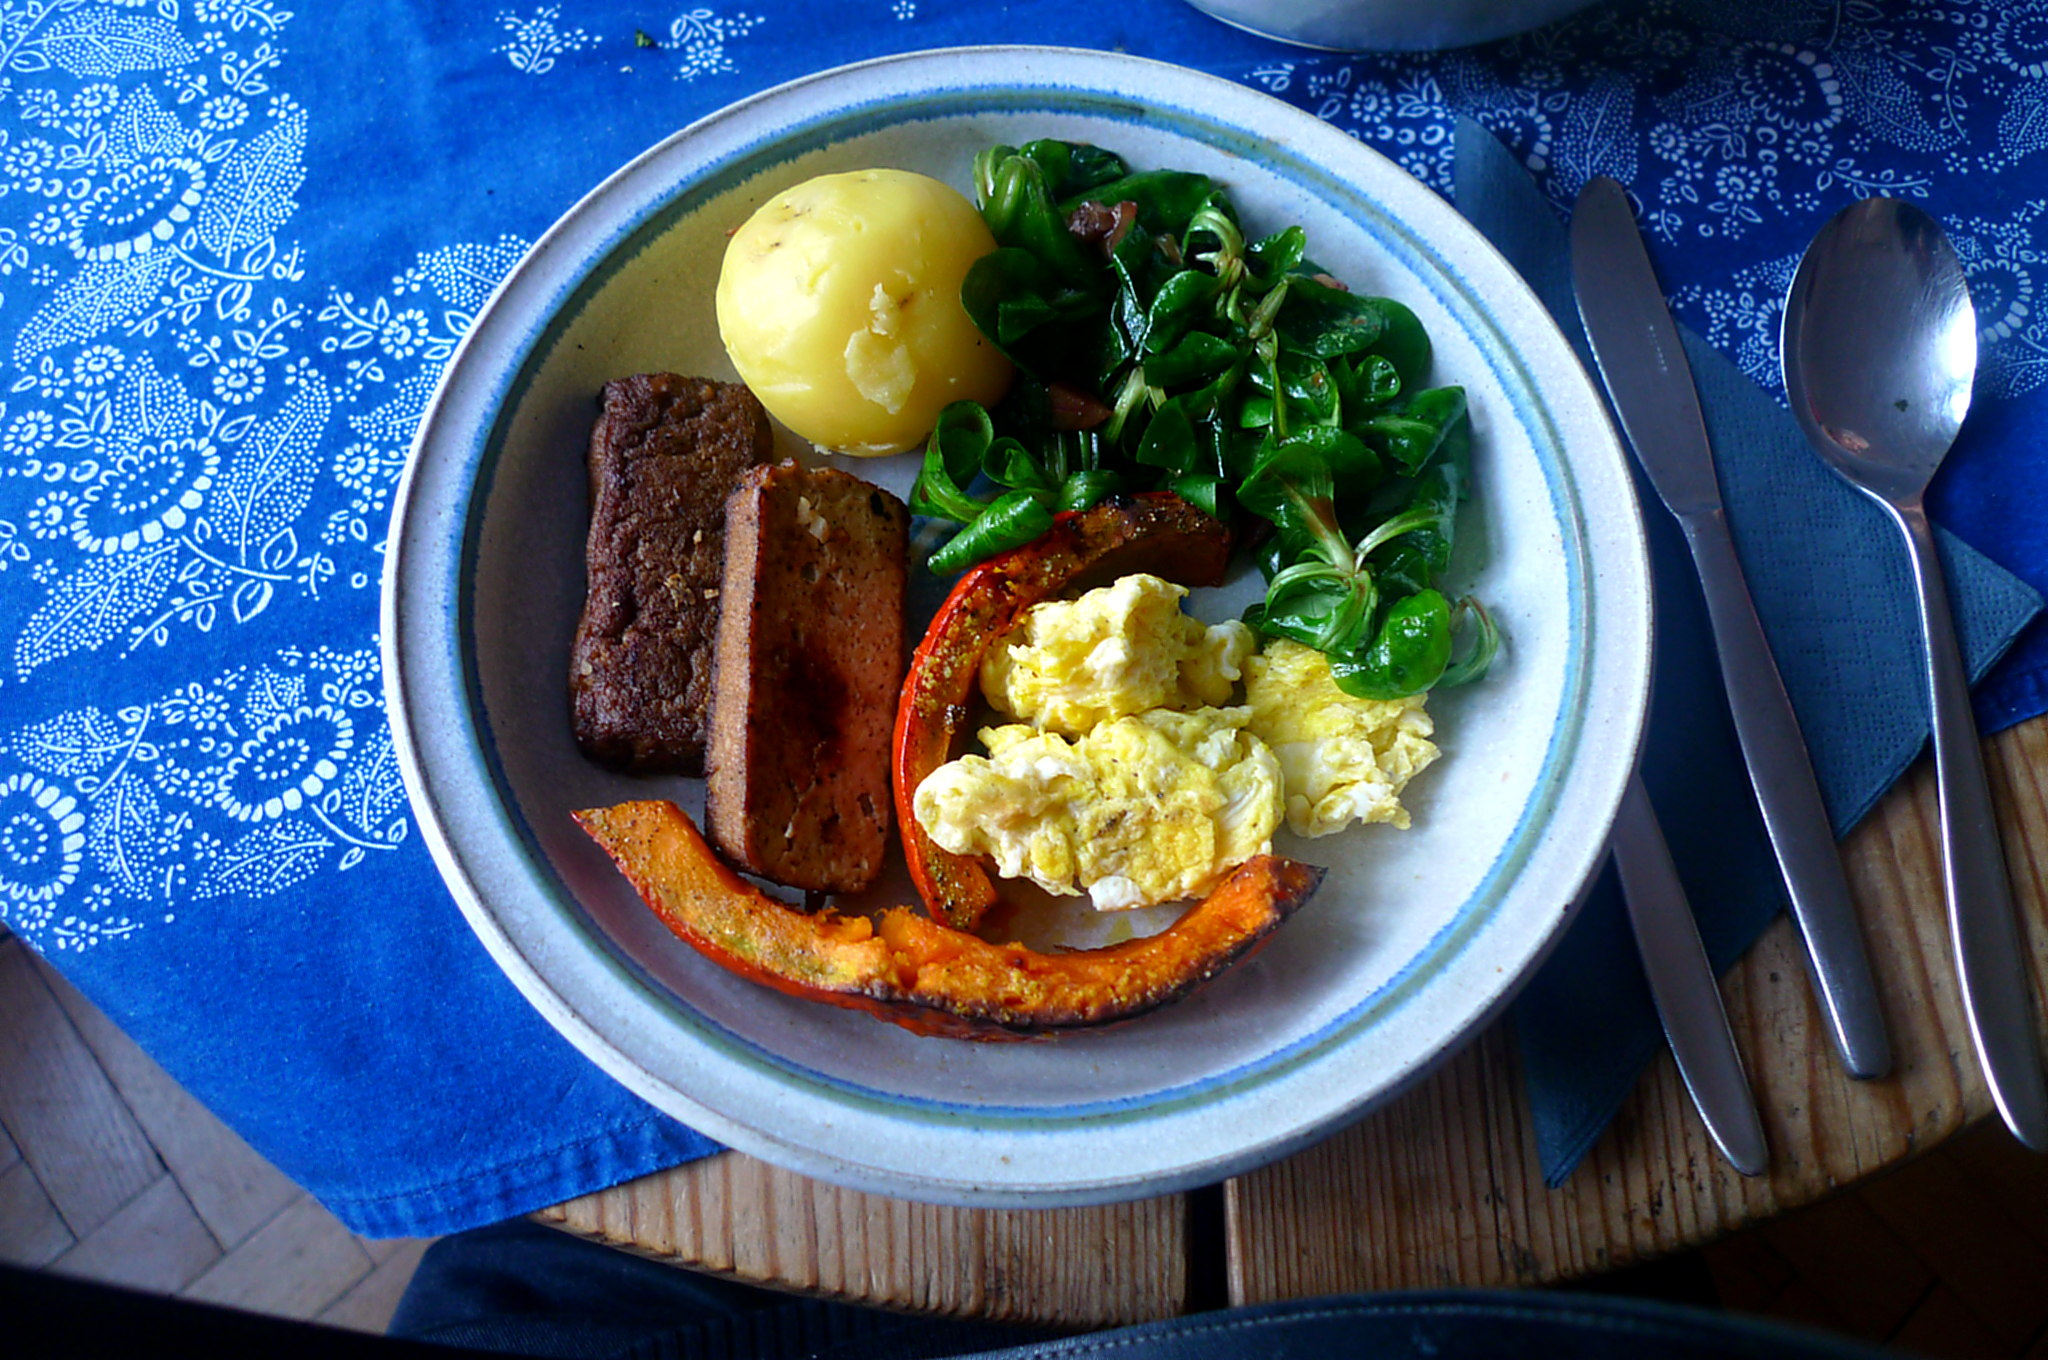 geraucherter-tofuhokkaidopellkartoffelnruhreifeldsalatmirabellenkompottvegetarisch-1